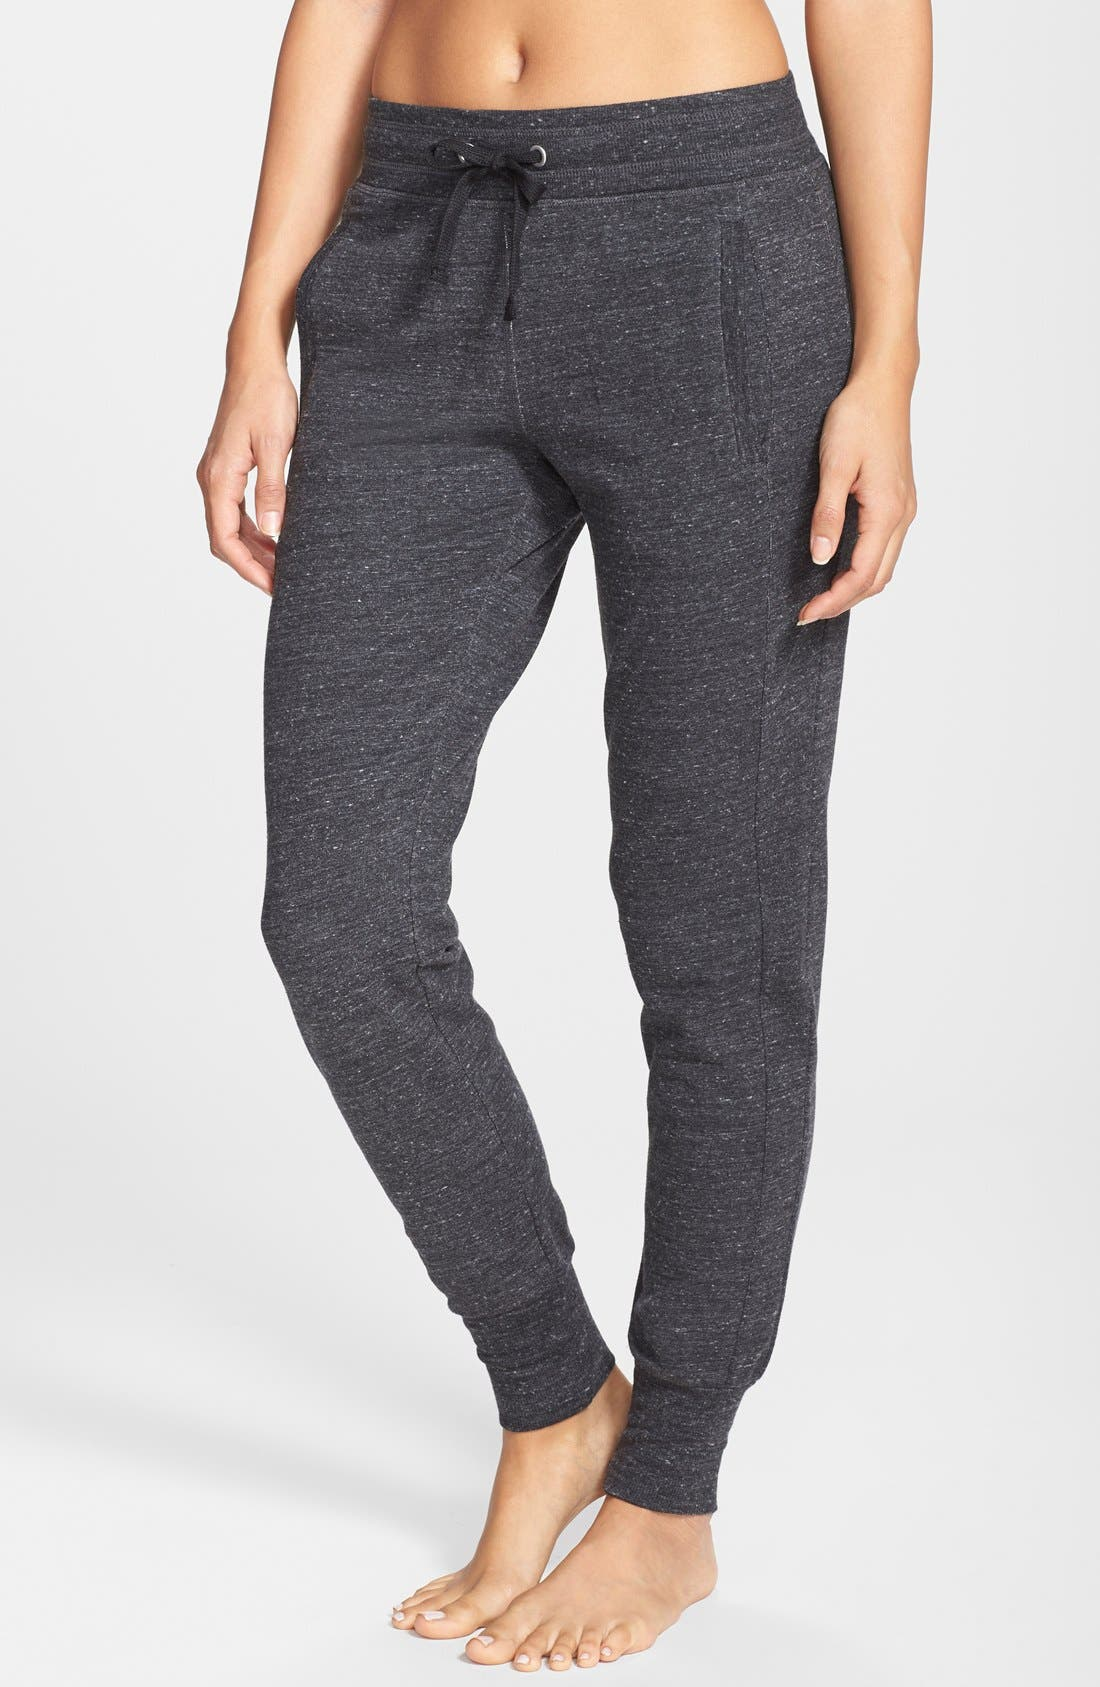 Alternate Image 1 Selected - Alo 'Verge' Sweatpants